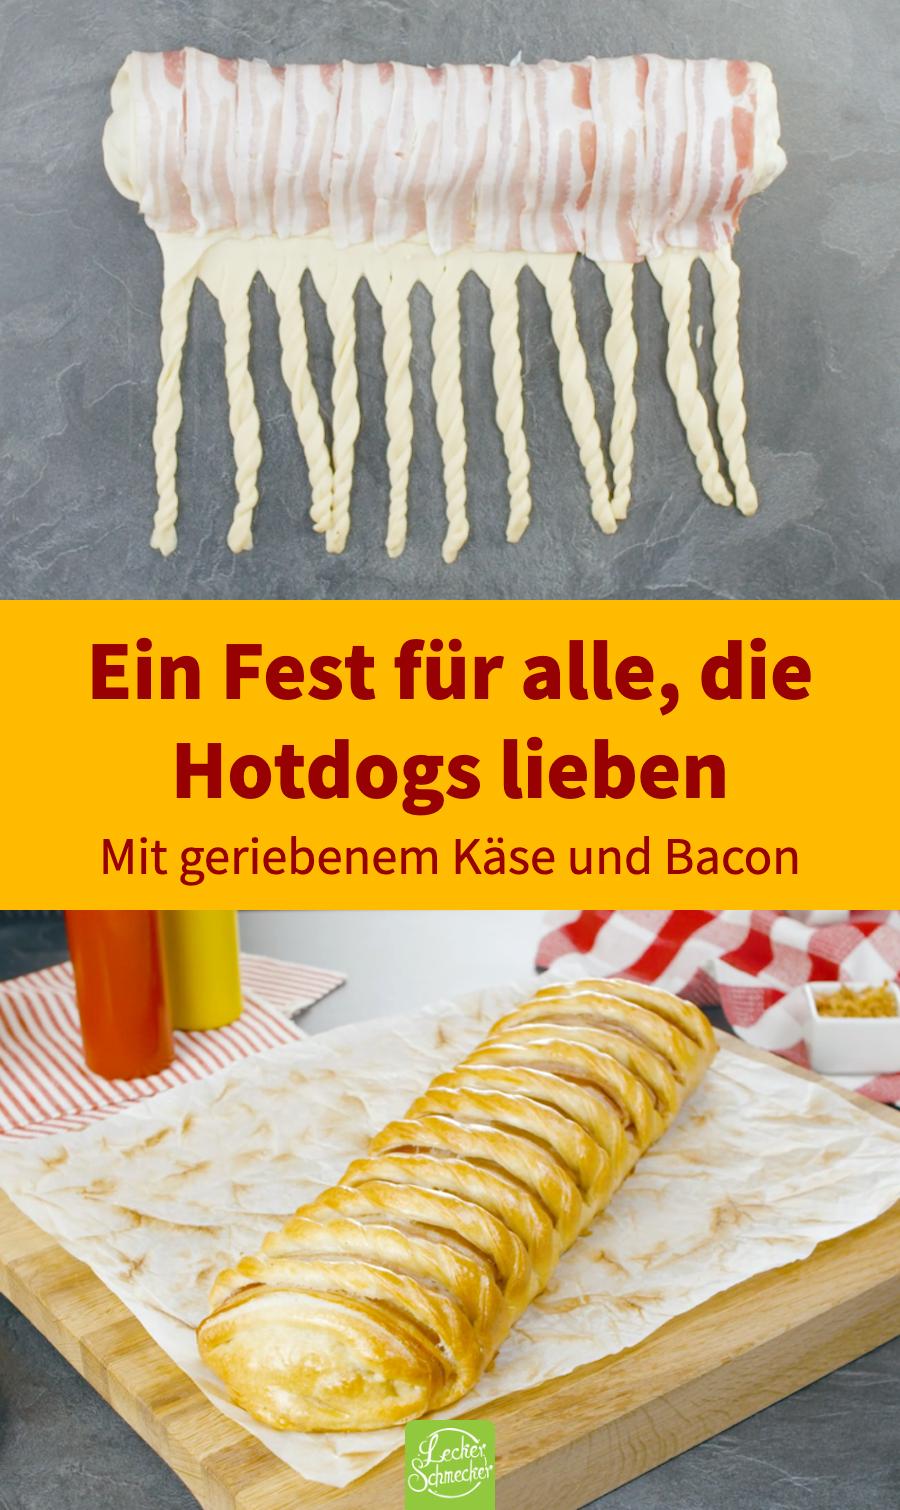 XXL Hot Dog Brot, umwickelt mit Bacon